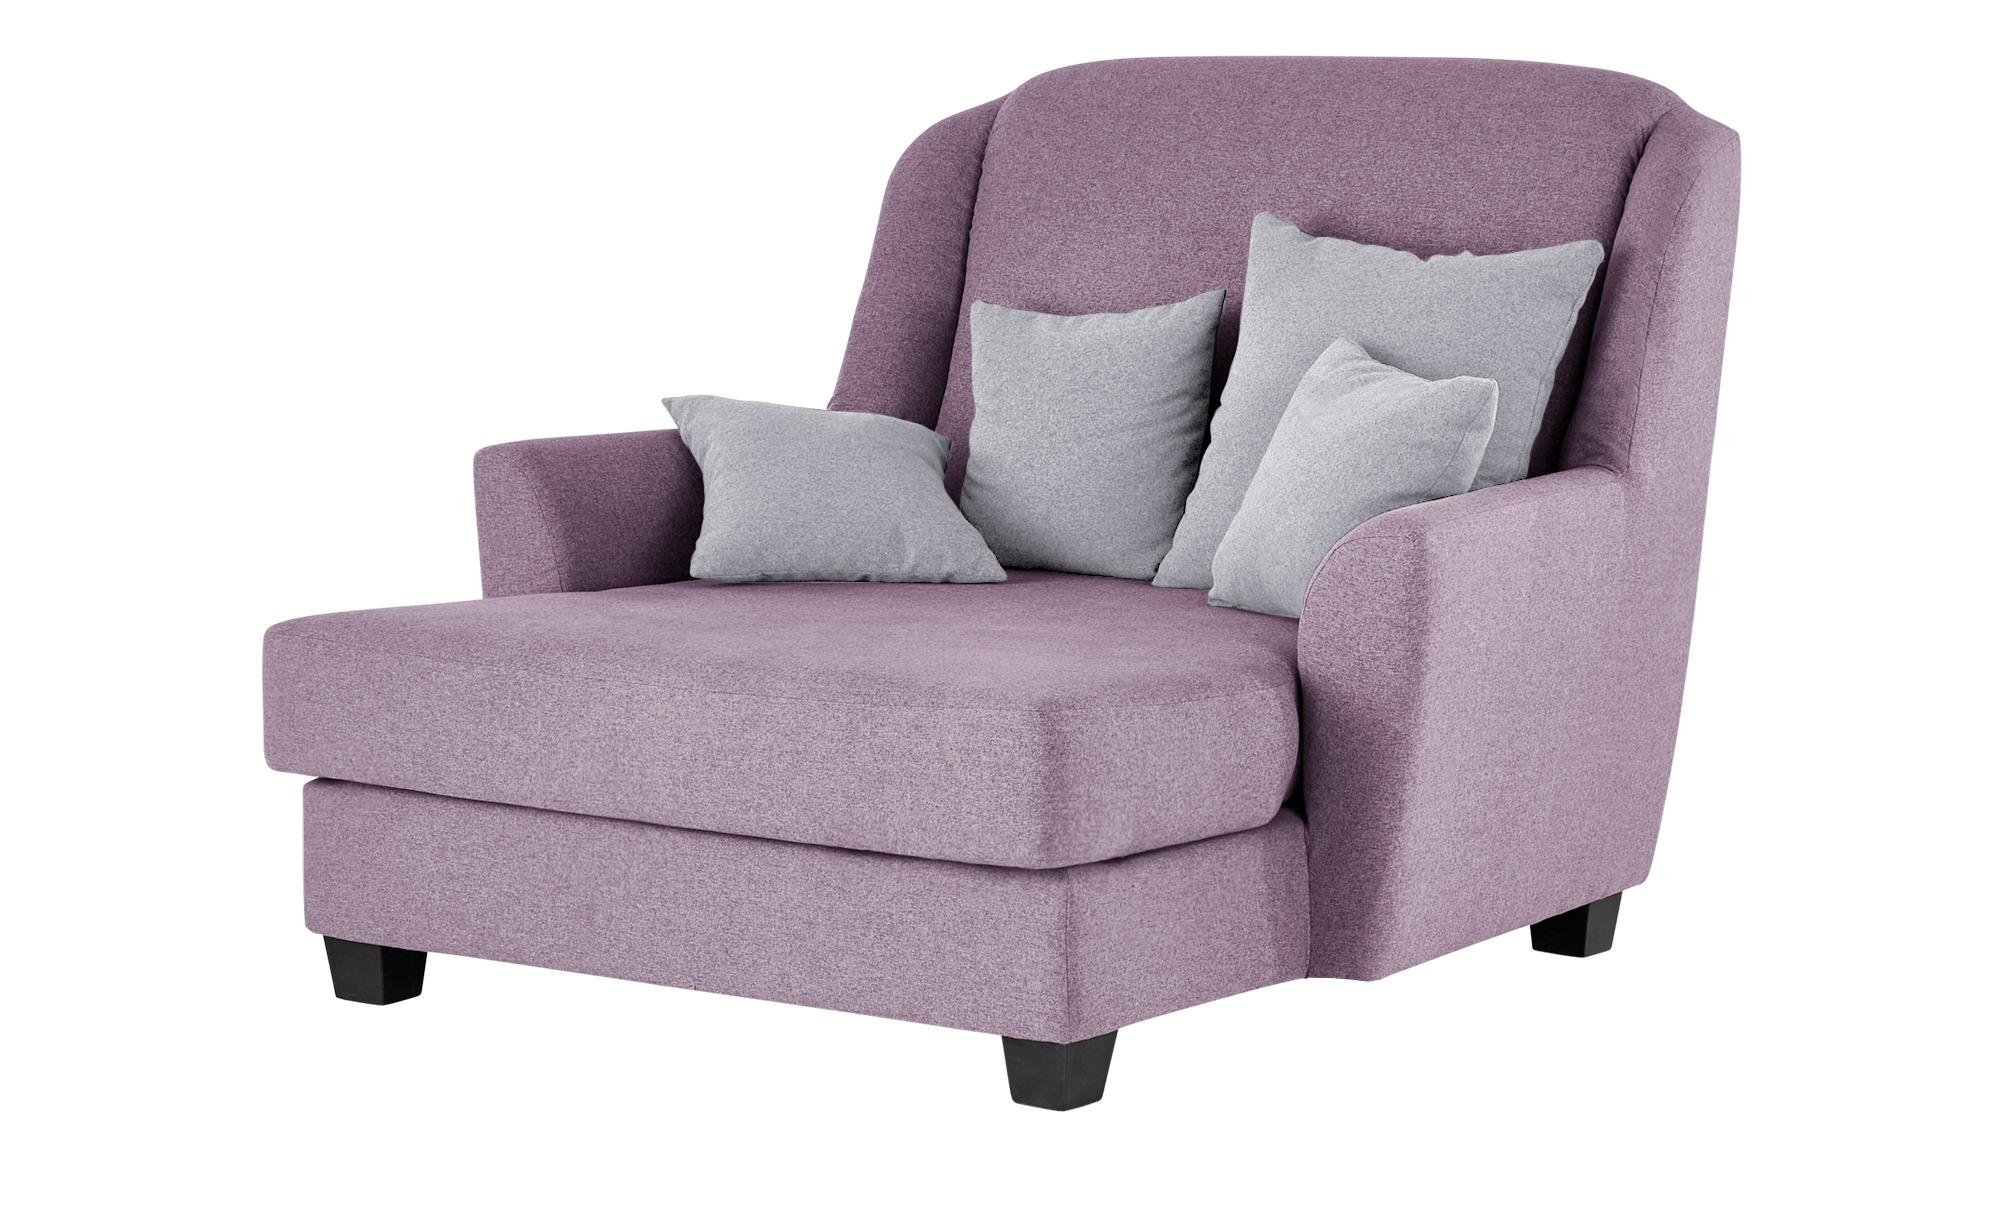 Smart Sessel Lisbeth Breite 135 Cm Höhe 100 Cm Rosapink Online